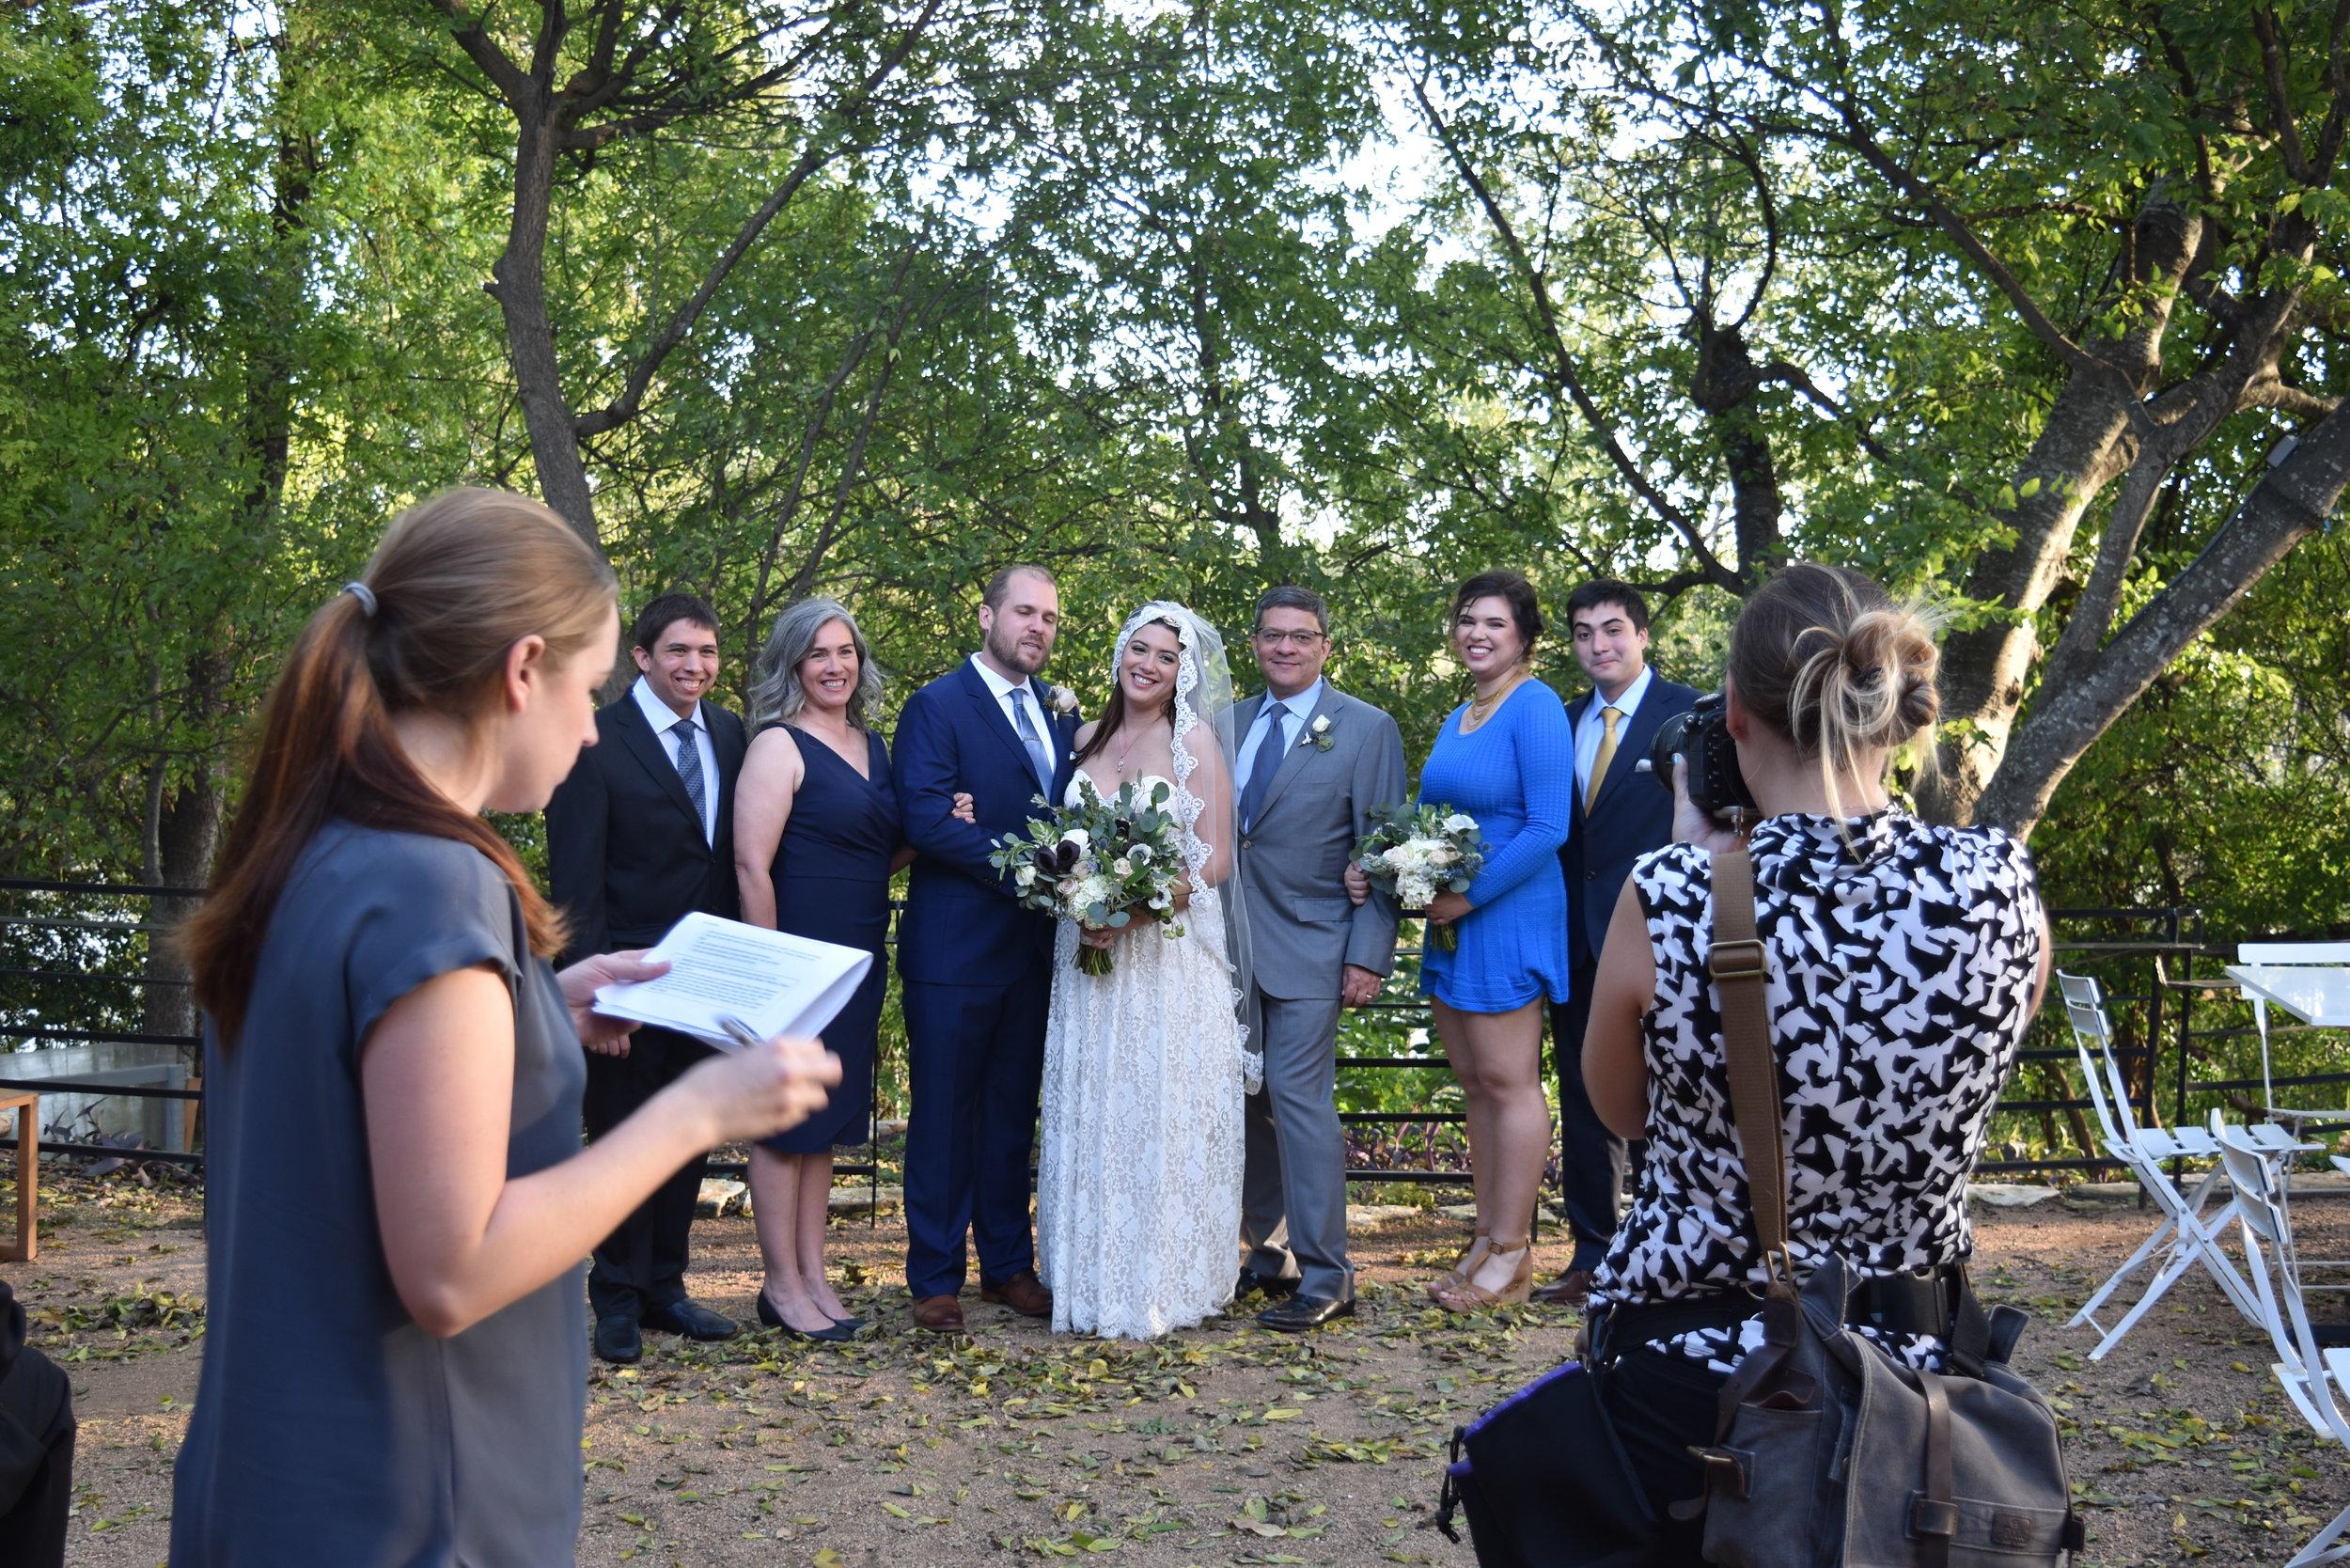 Tillery as Wedding Venue 137.JPG